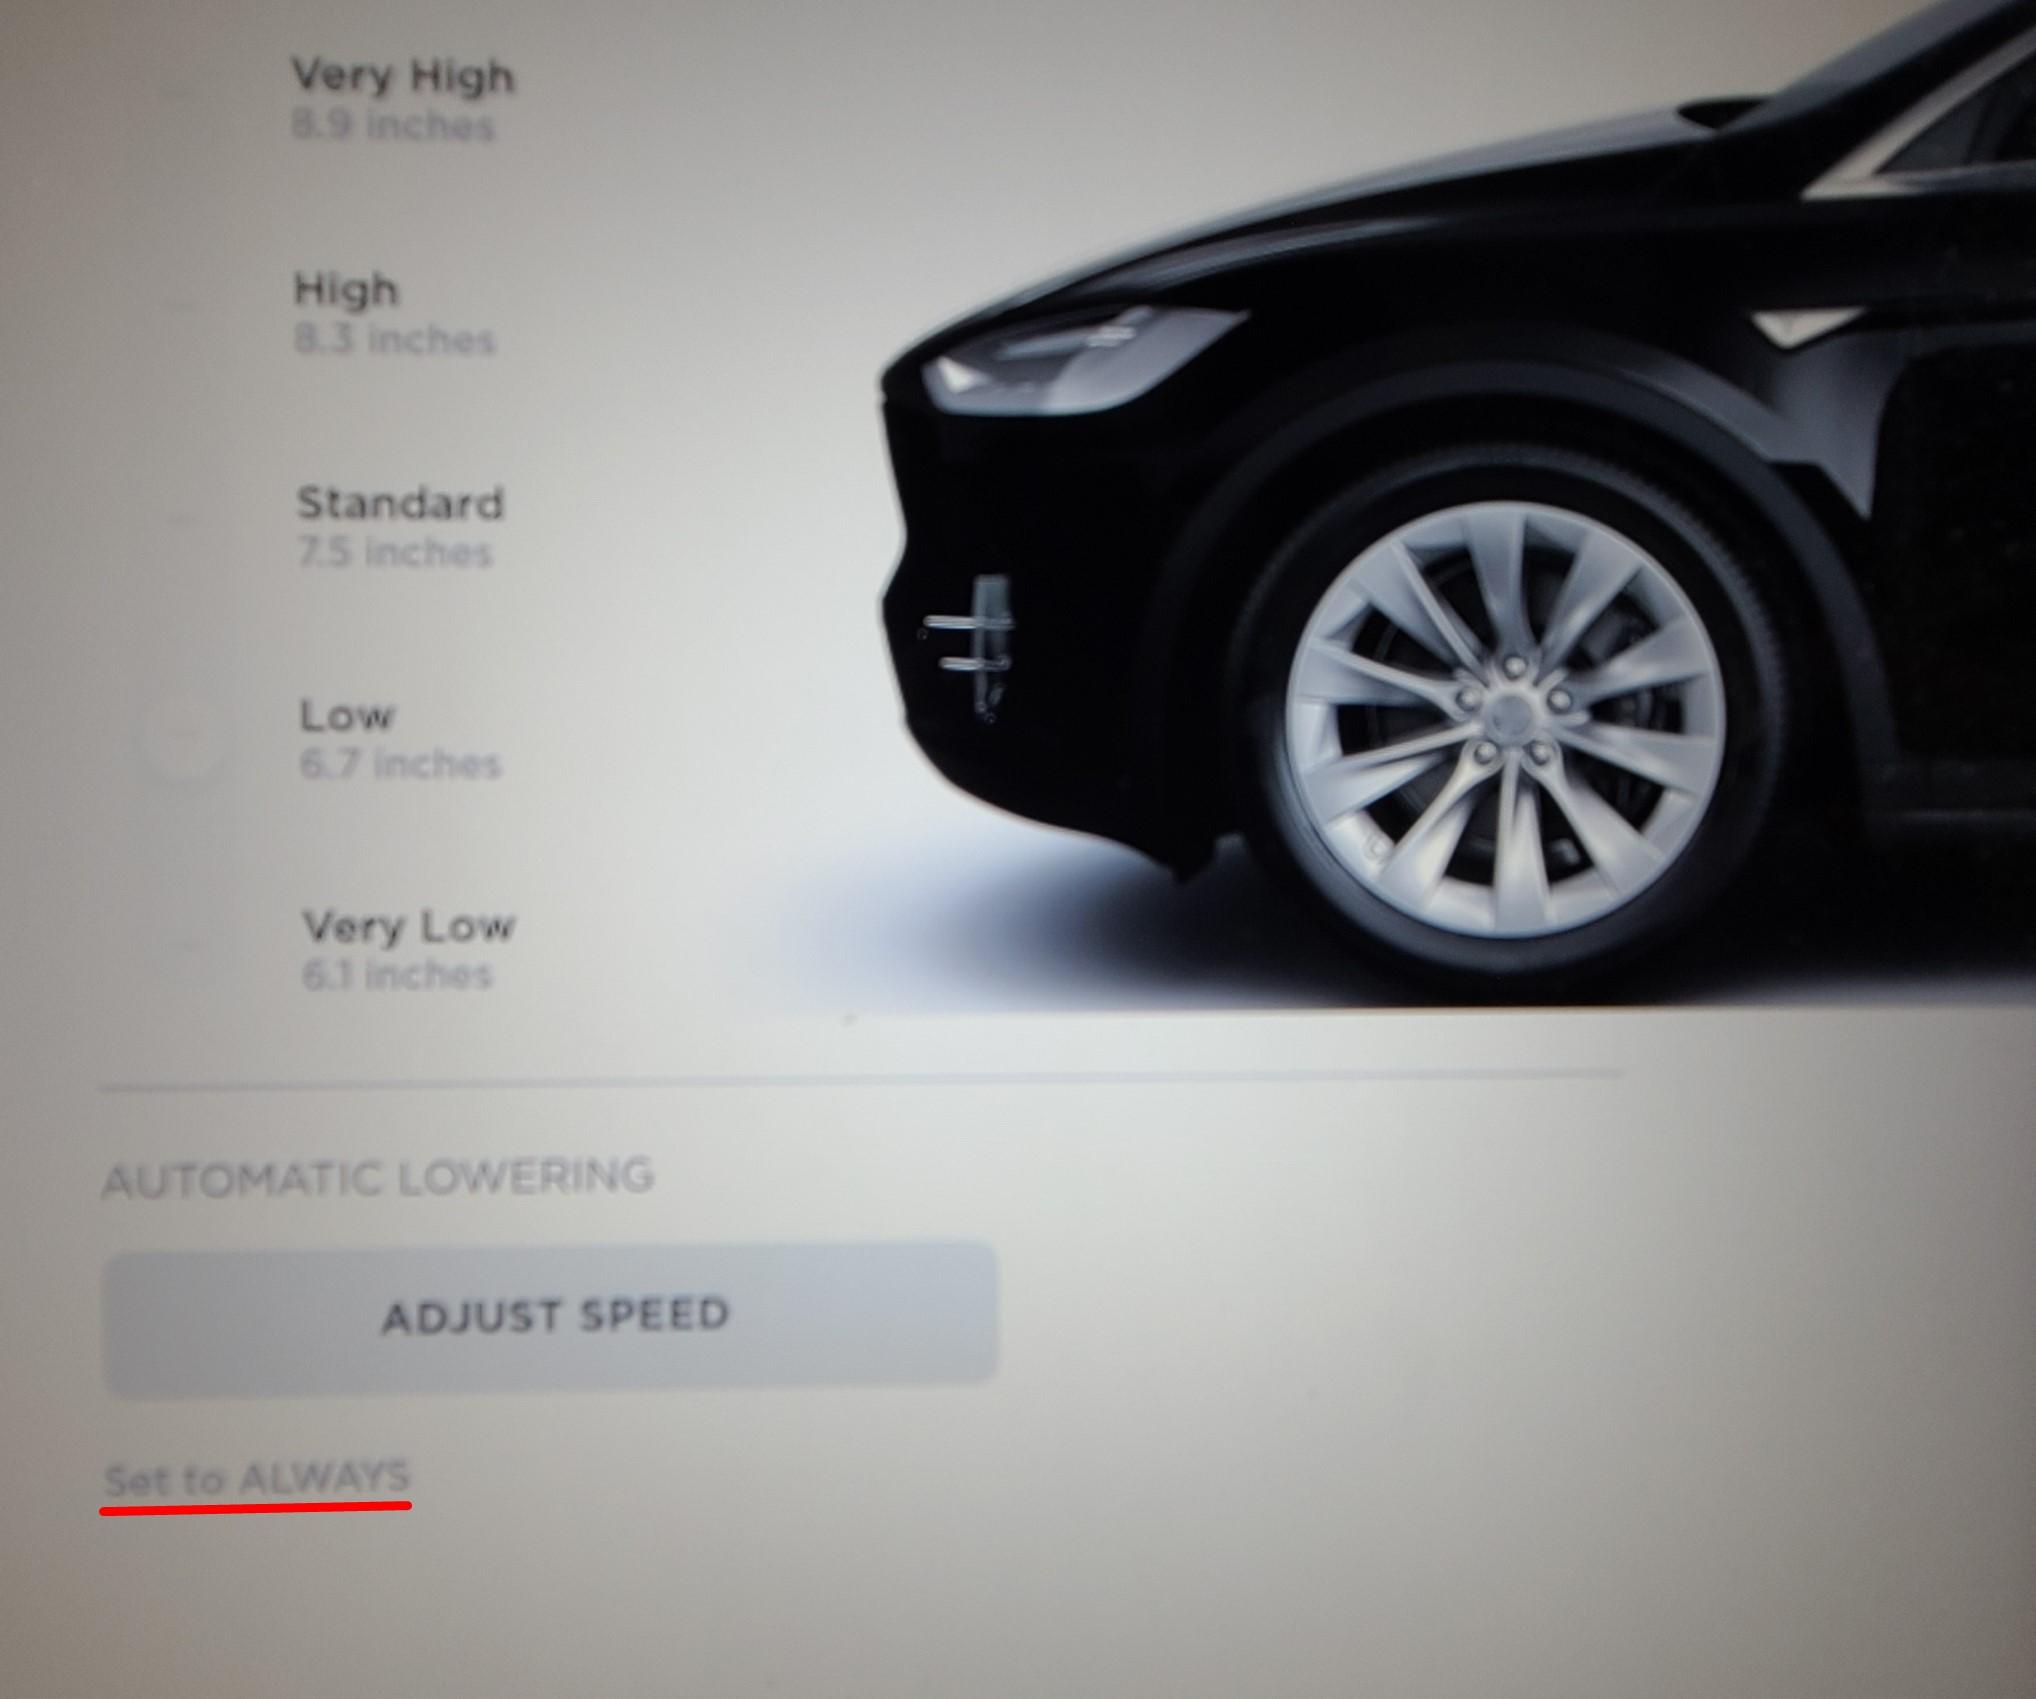 Tesla X monitor, software set to always low